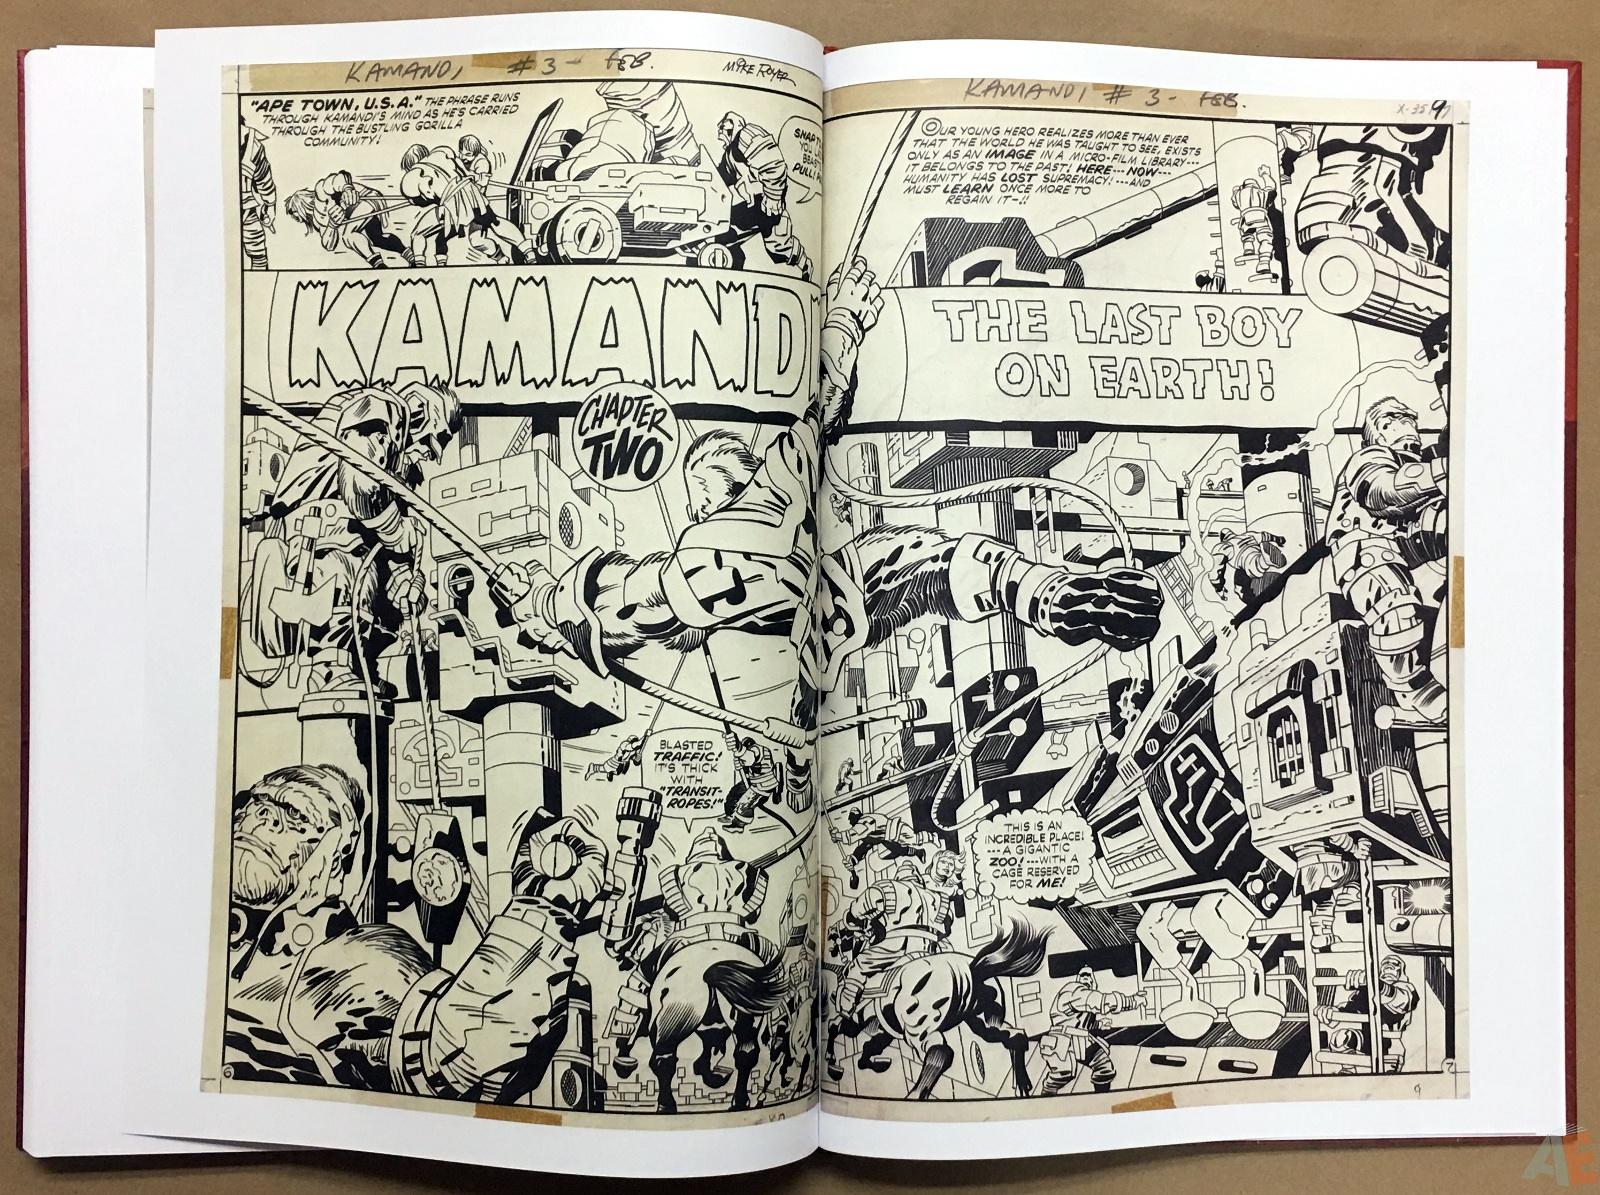 Jack Kirby Kamandi The Last Boy On Earth Artist's Edition 48